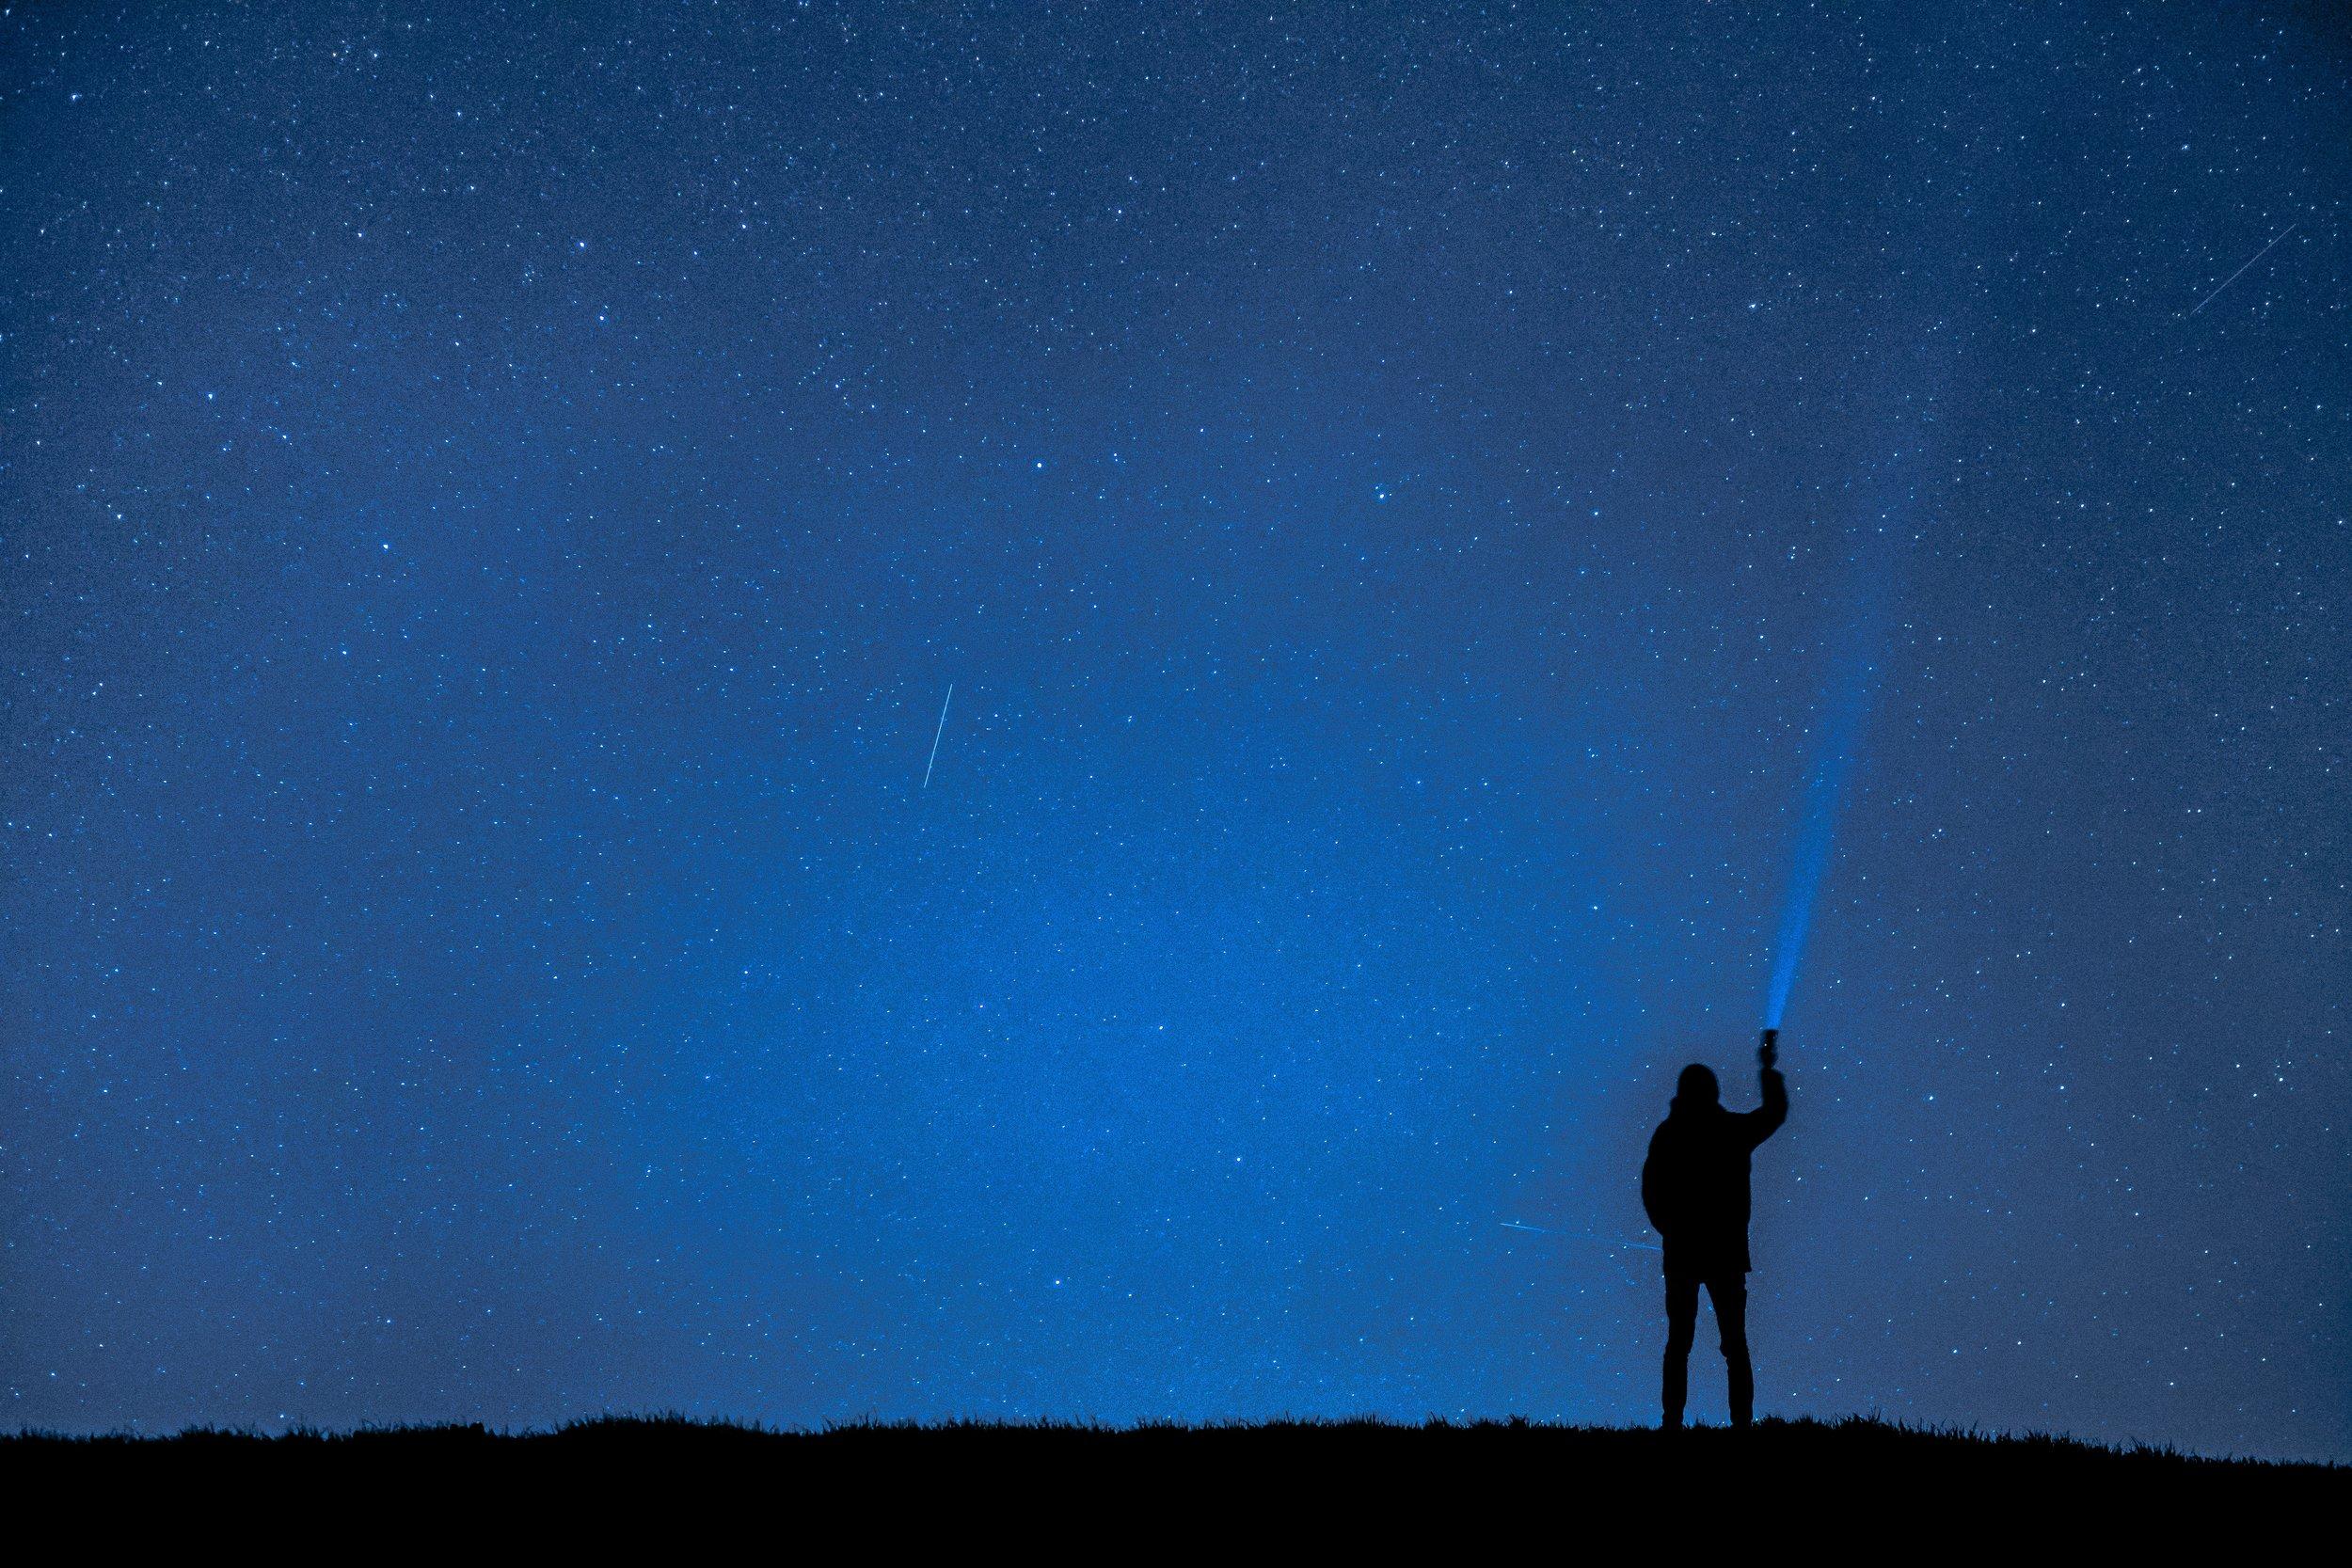 night-photograph-2180474.jpg